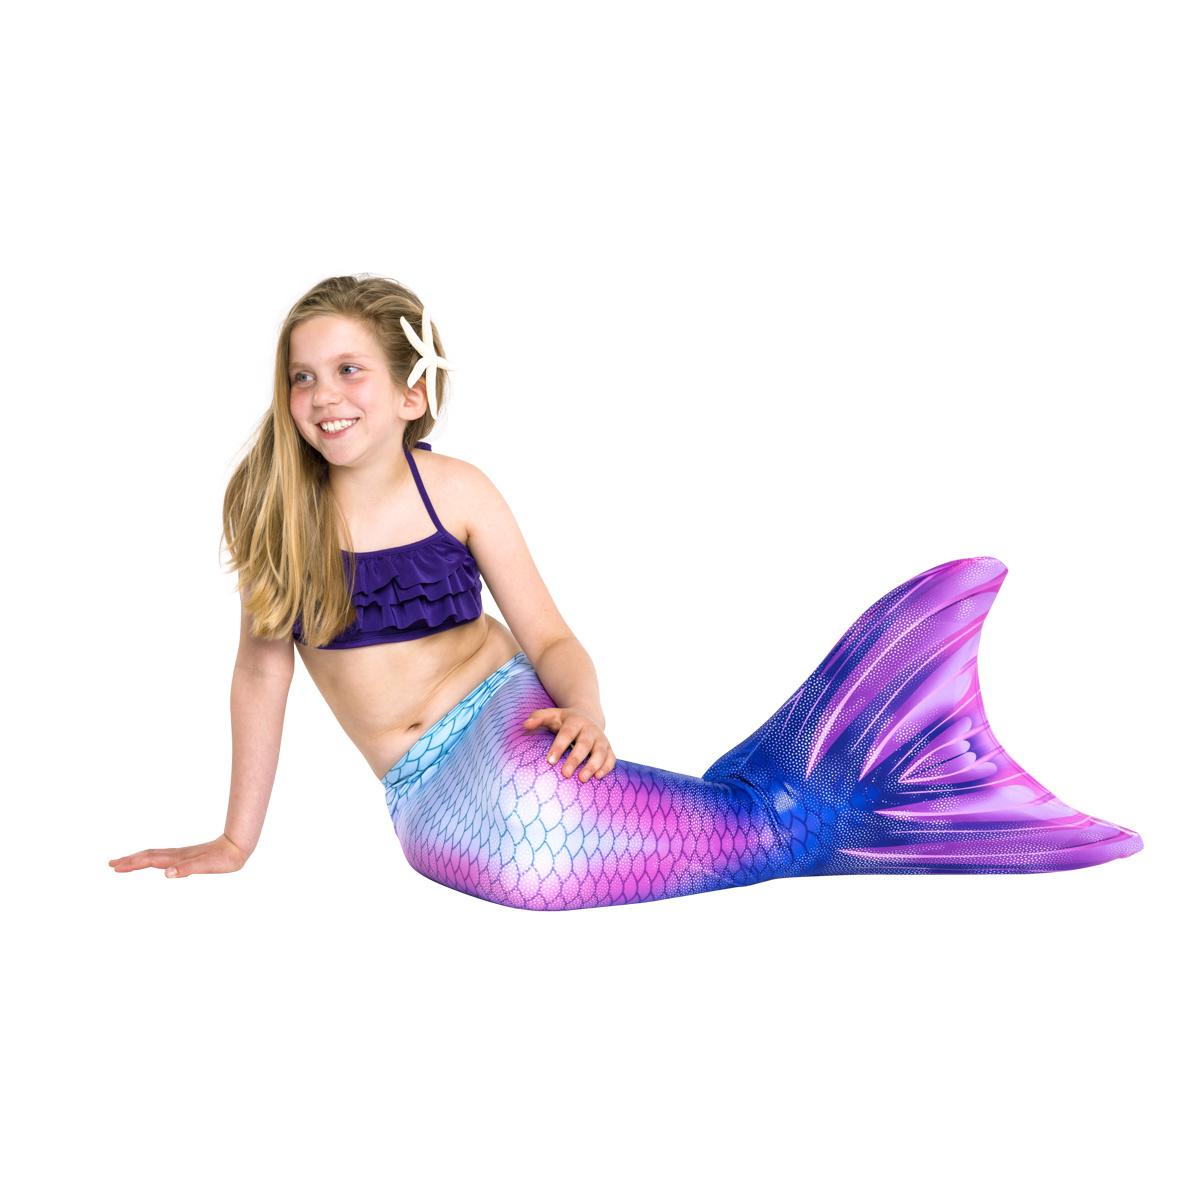 NoordZeemeermin The Perfect Swirl mermaid tail